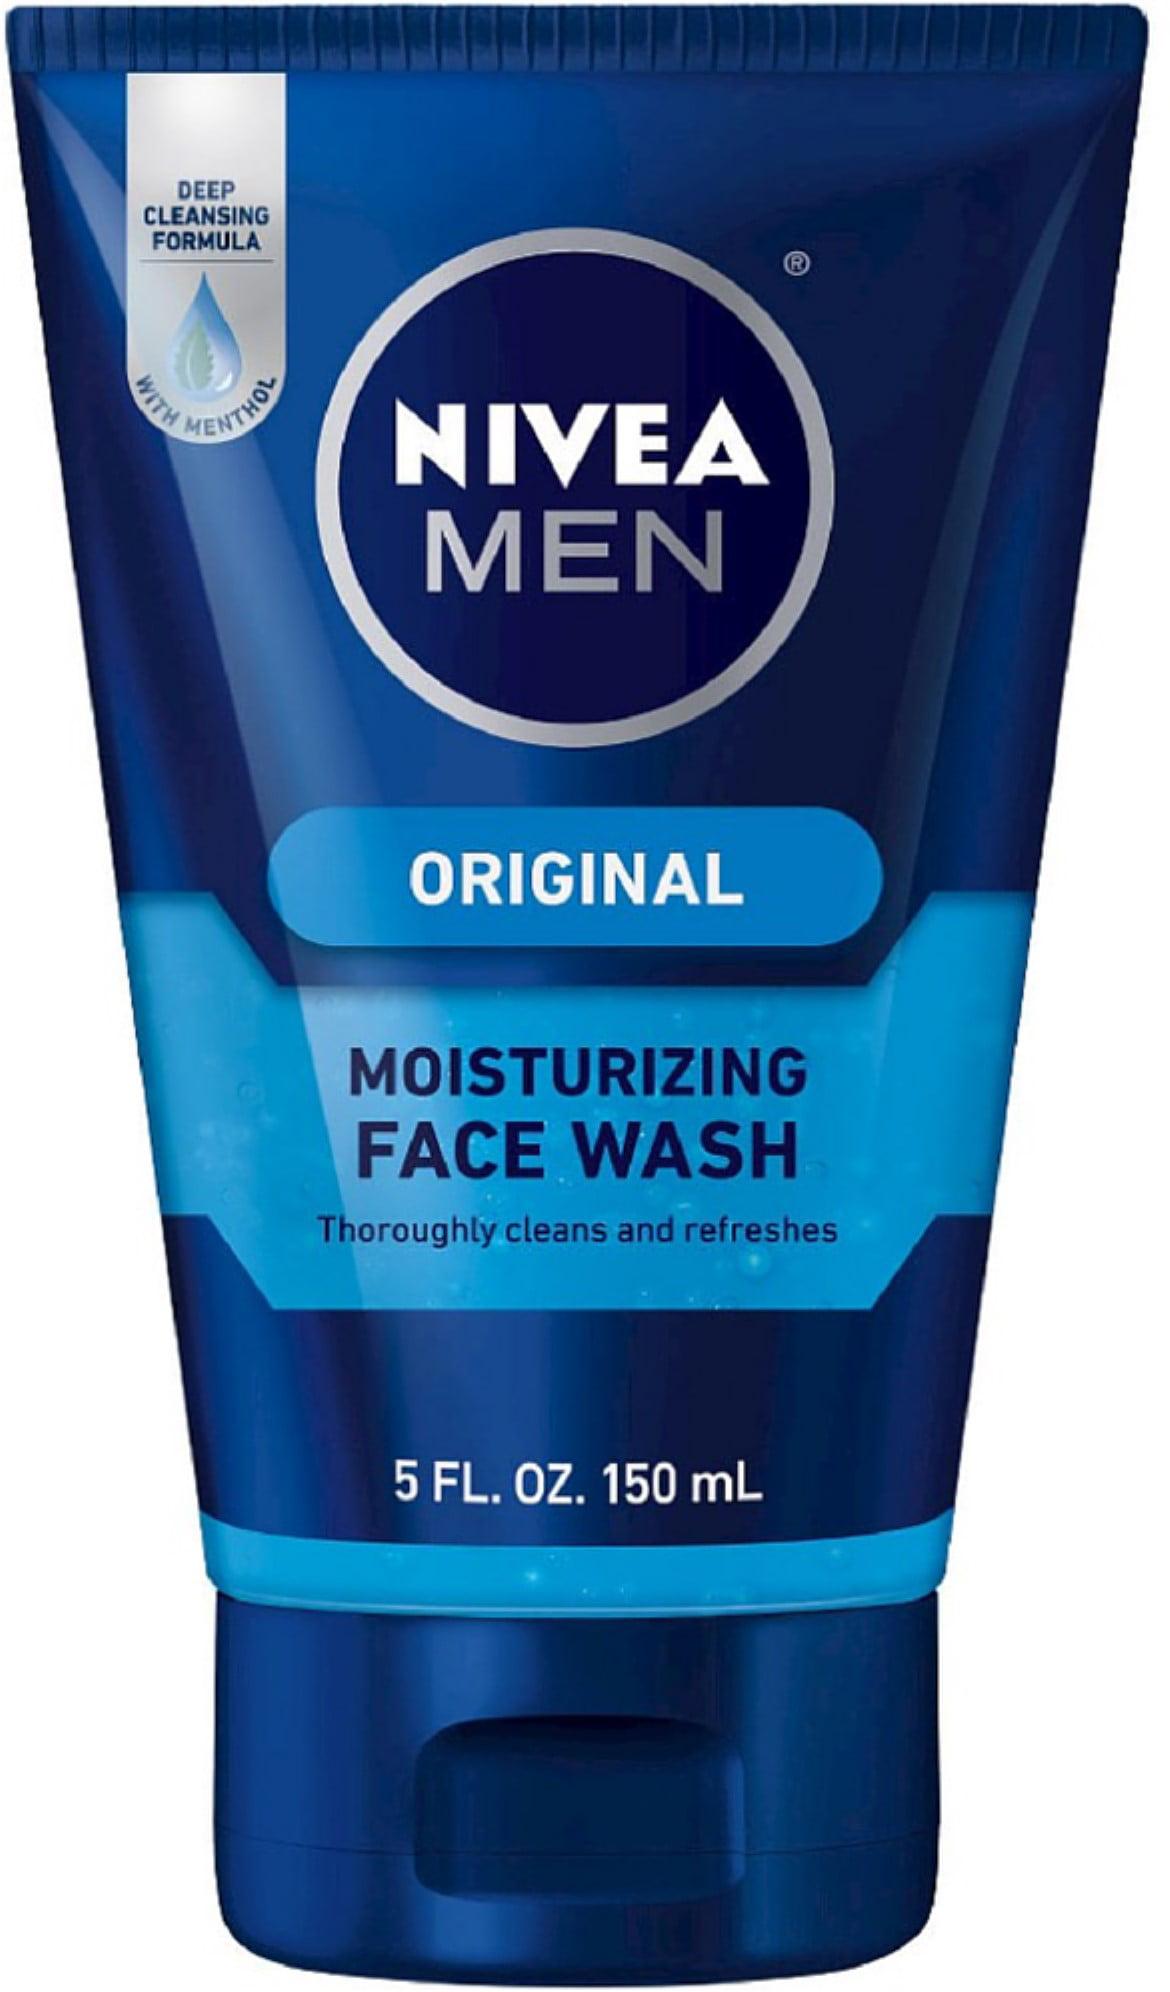 2 Pack - NIVEA FOR MEN Original Moisturizing Face Wash 5 oz Ren - No.1 Purity Cleansing Balm - 100ml/3.3oz